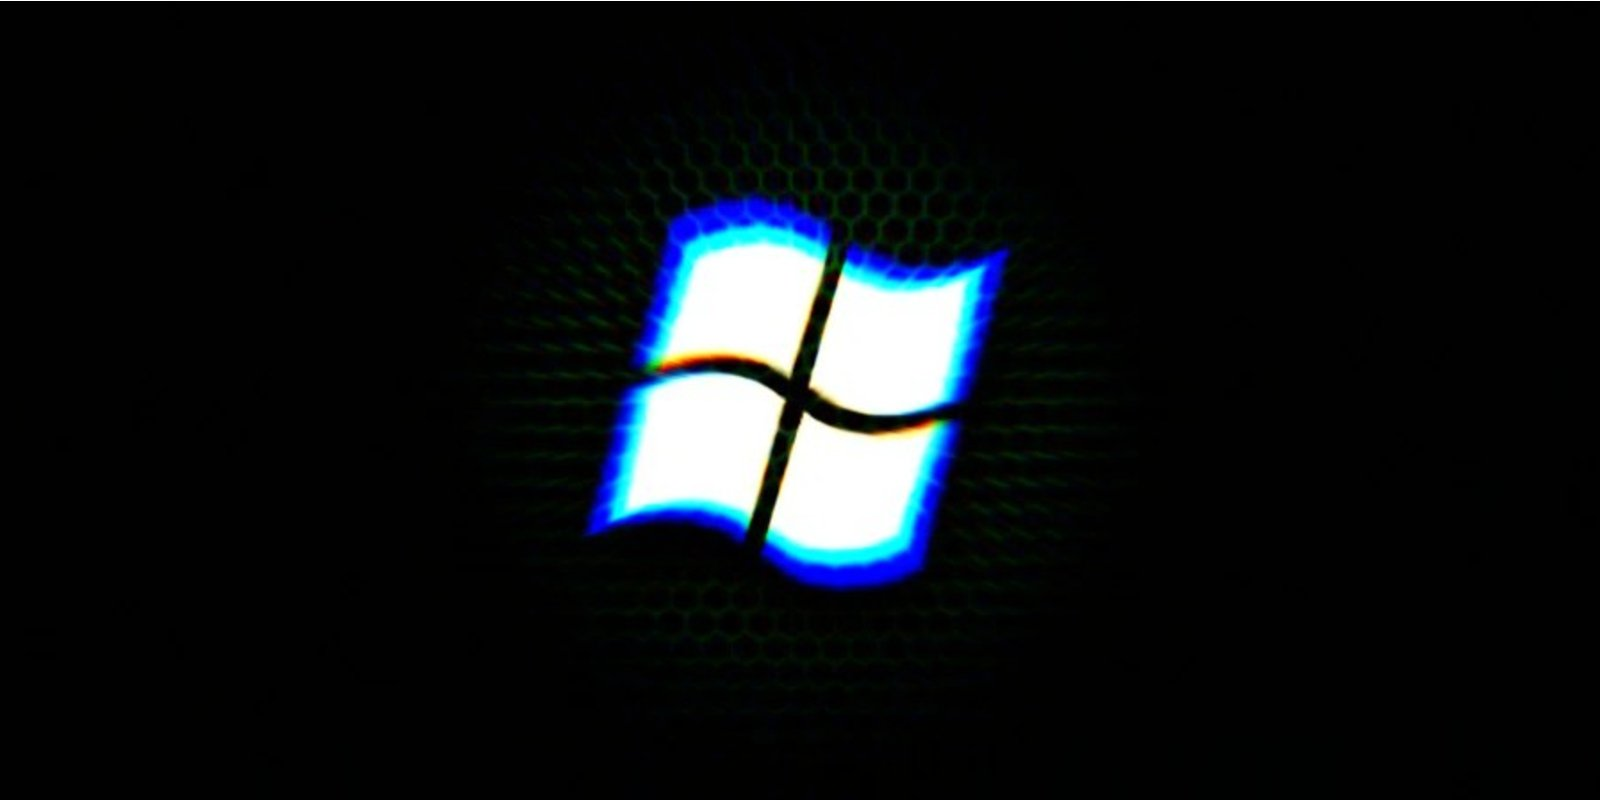 Microsoft no longer offers Windows 7 drivers through Windows Update